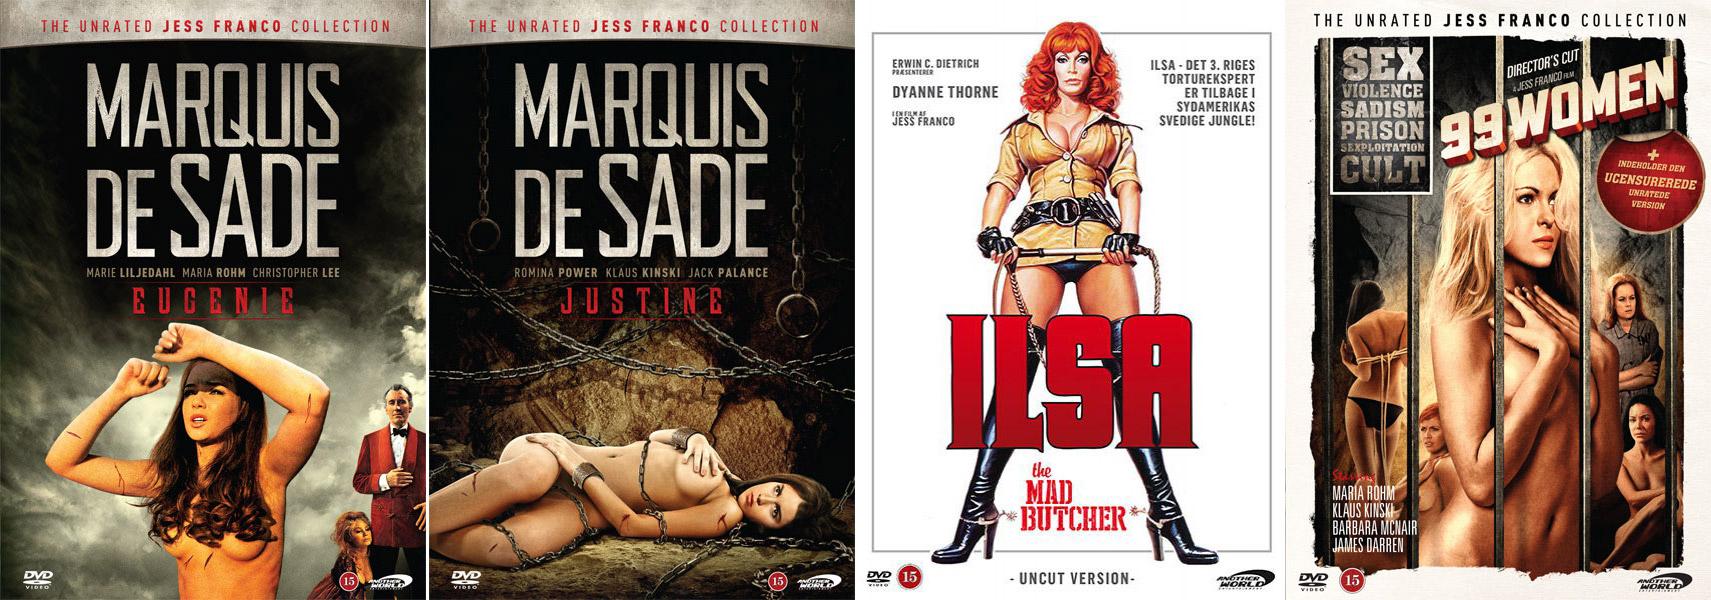 marquis-de-sade-justine-eugine-ilsa-99-women